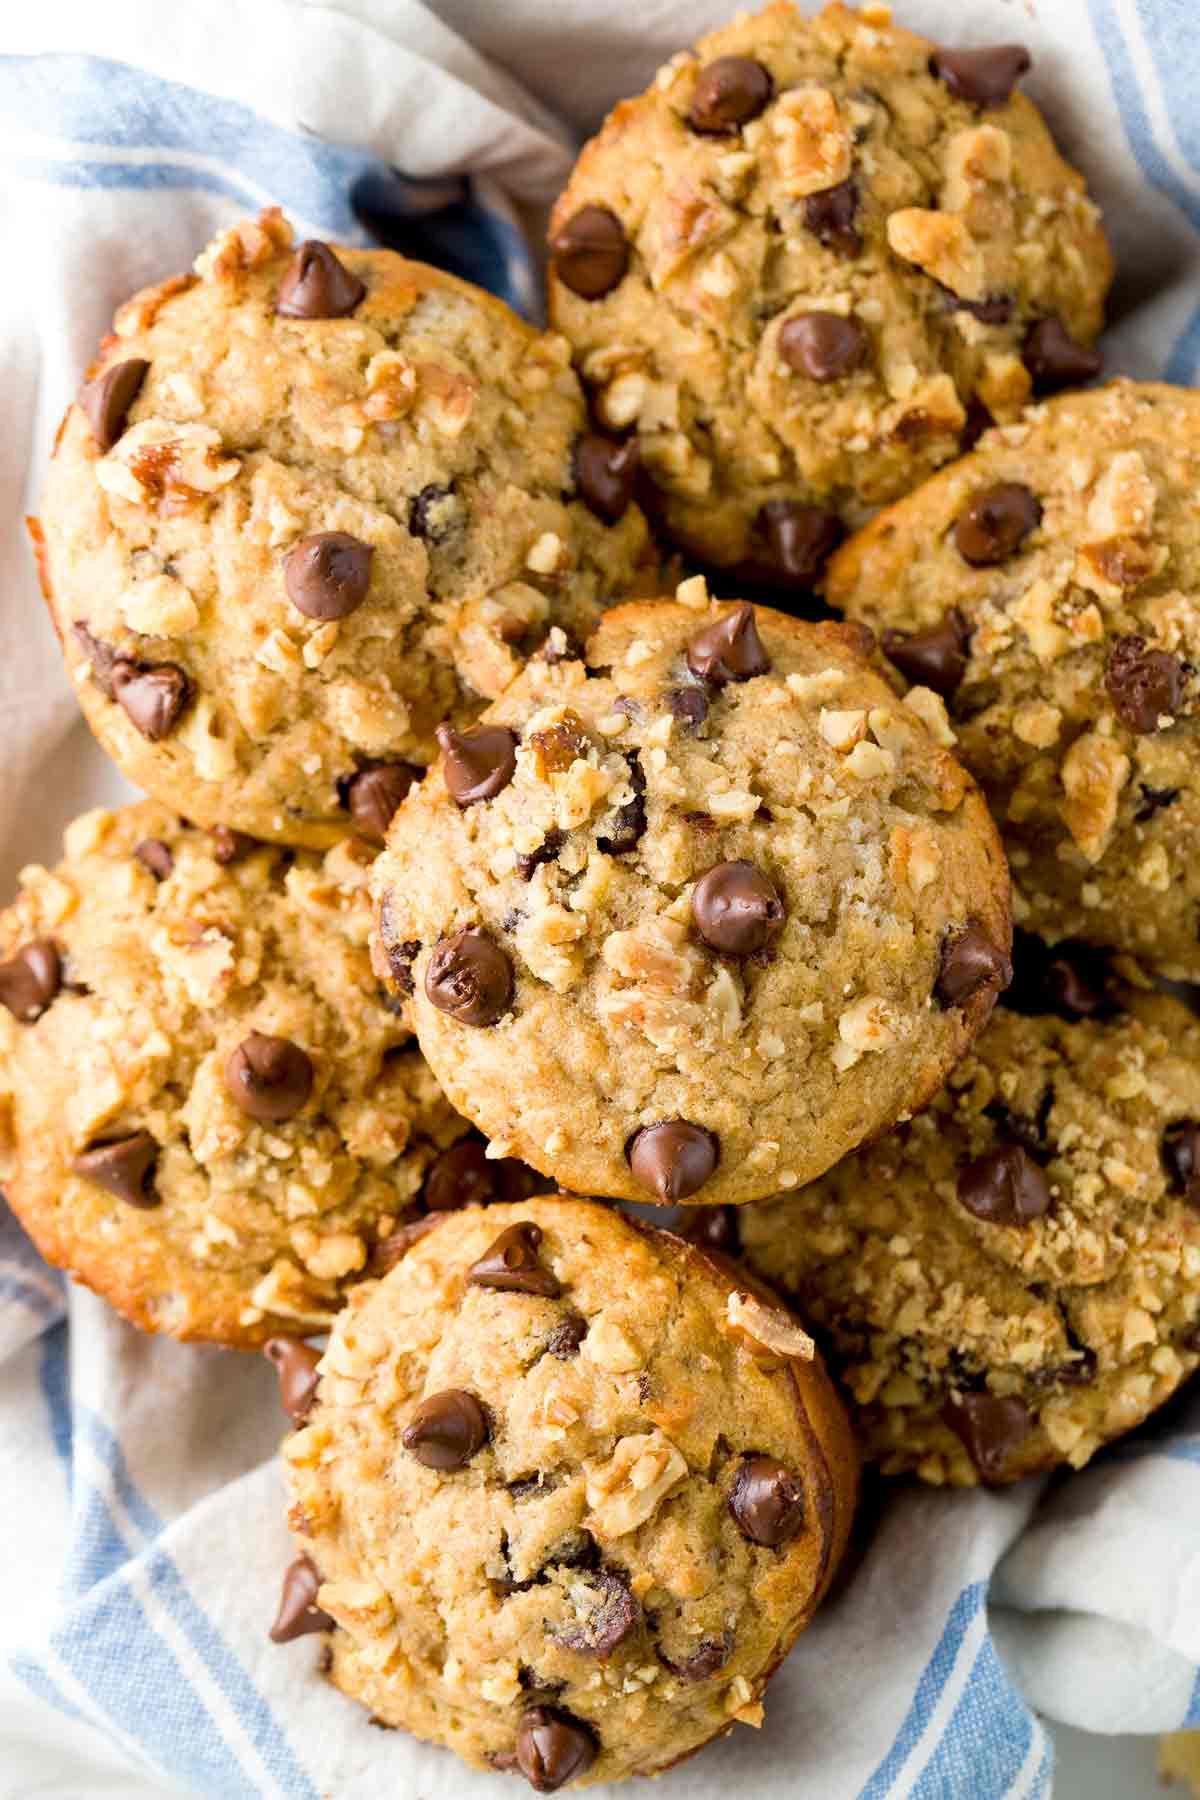 Banana Chocolate Chip Muffins Healthy  Banana Chocolate Chip Muffins Topped with Walnuts